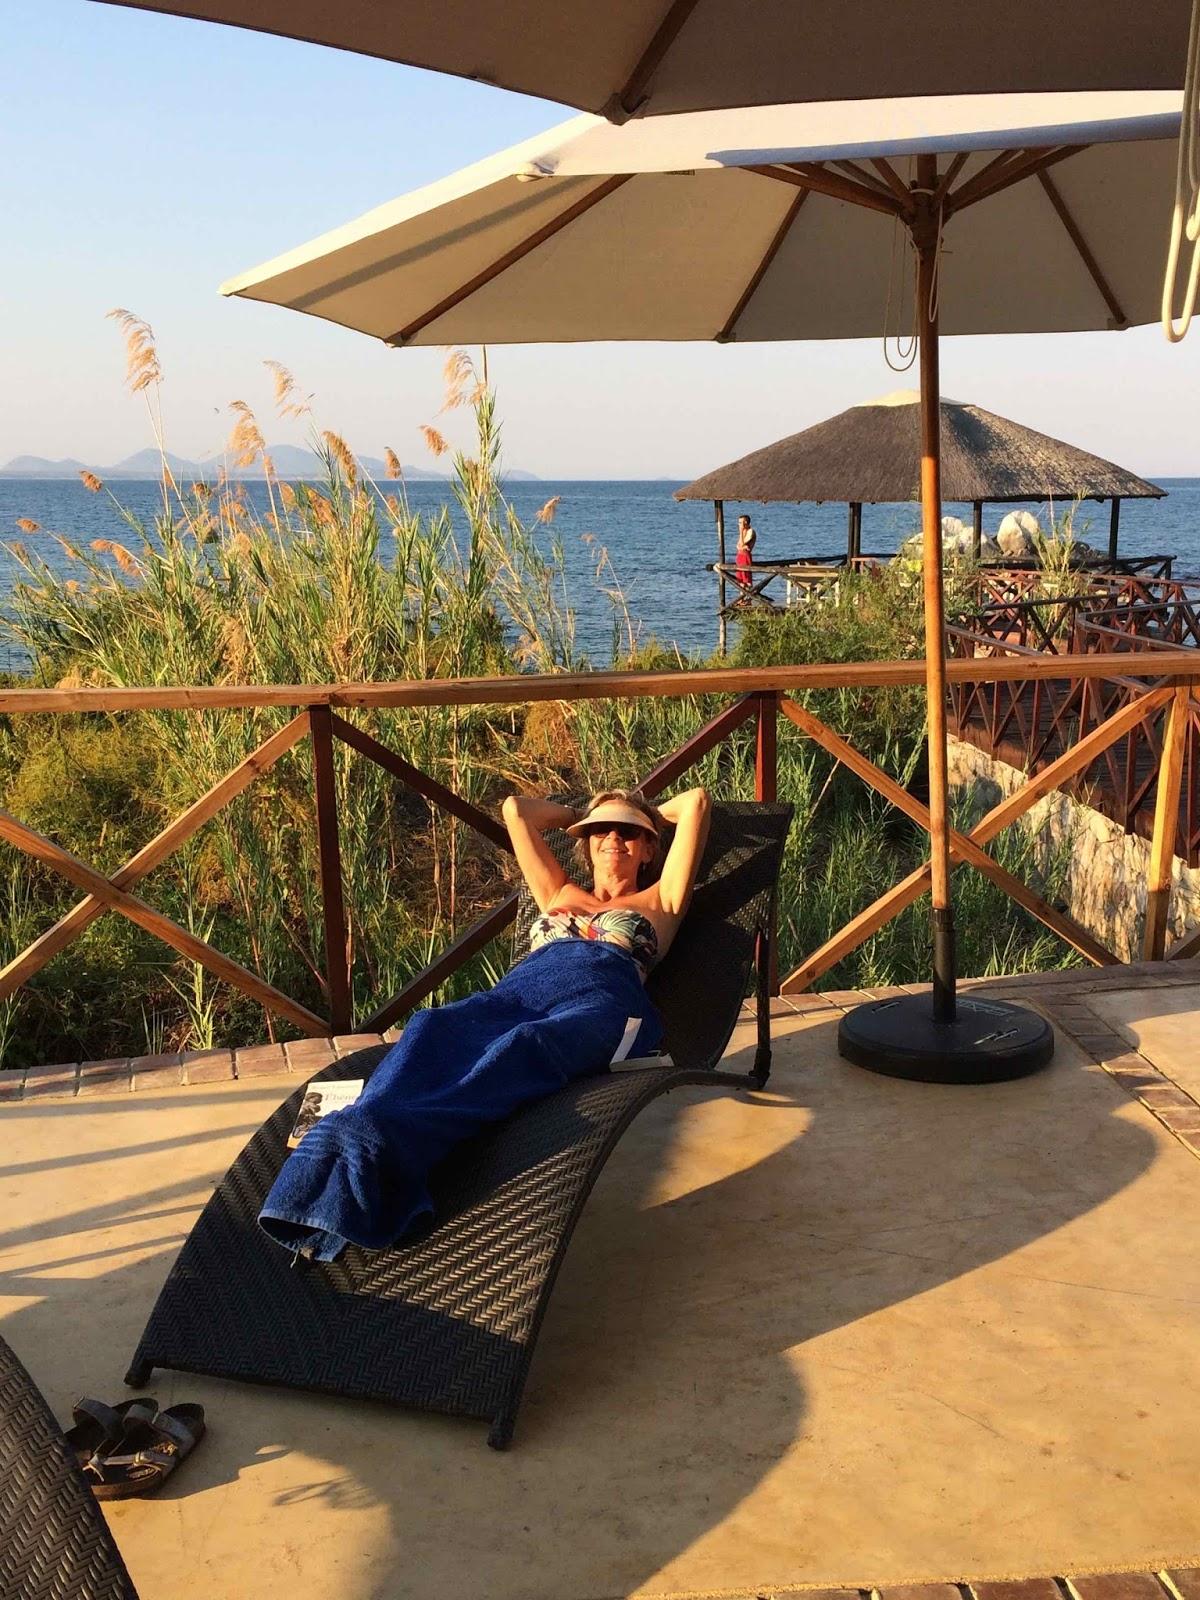 Piscine avec toboggan ile de france - Hotel avec piscine seine et marne ...